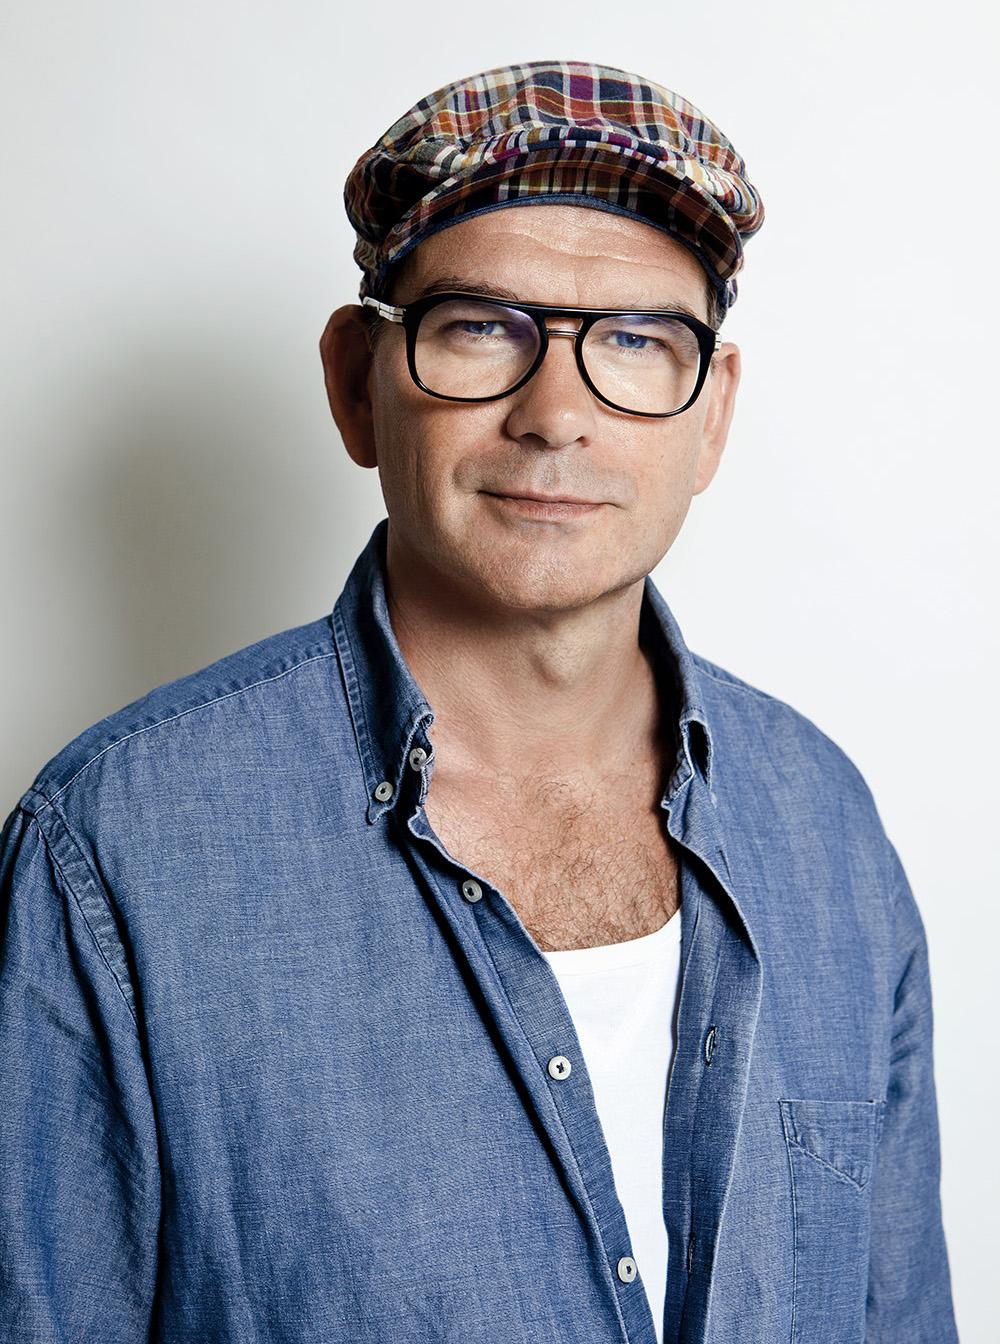 skådespelare porträtt Magnus Roosmann unique talents foto David Falk